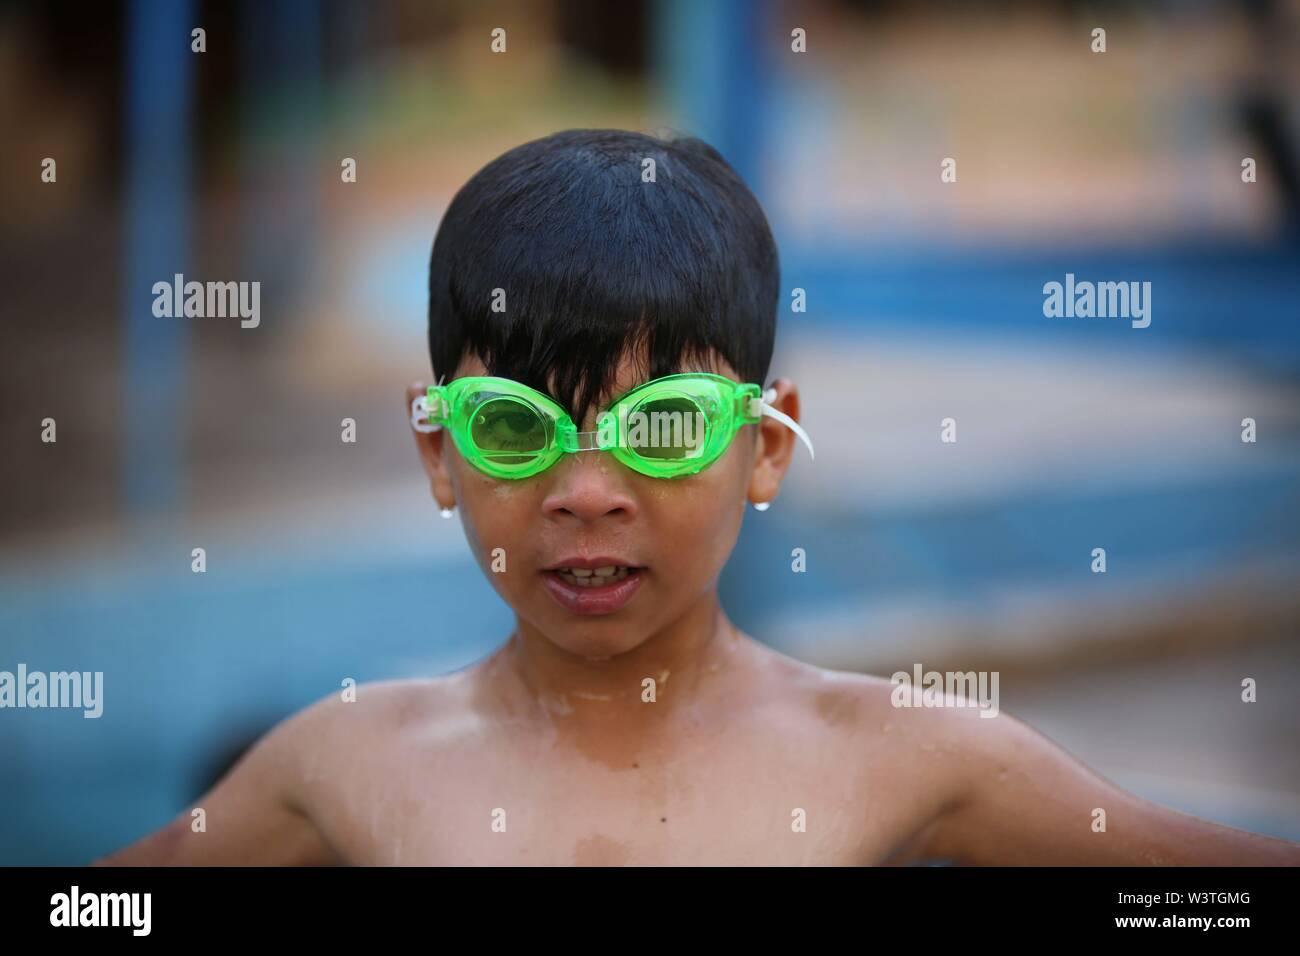 Gaza City, The Gaza Strip, Palestine. 17th July, 2019. A Palestinian boy play at a swimming pool on a hot day in the Gaza Strip. Credit: Hassan Jedi/Quds Net News/ZUMA Wire/Alamy Live News - Stock Image